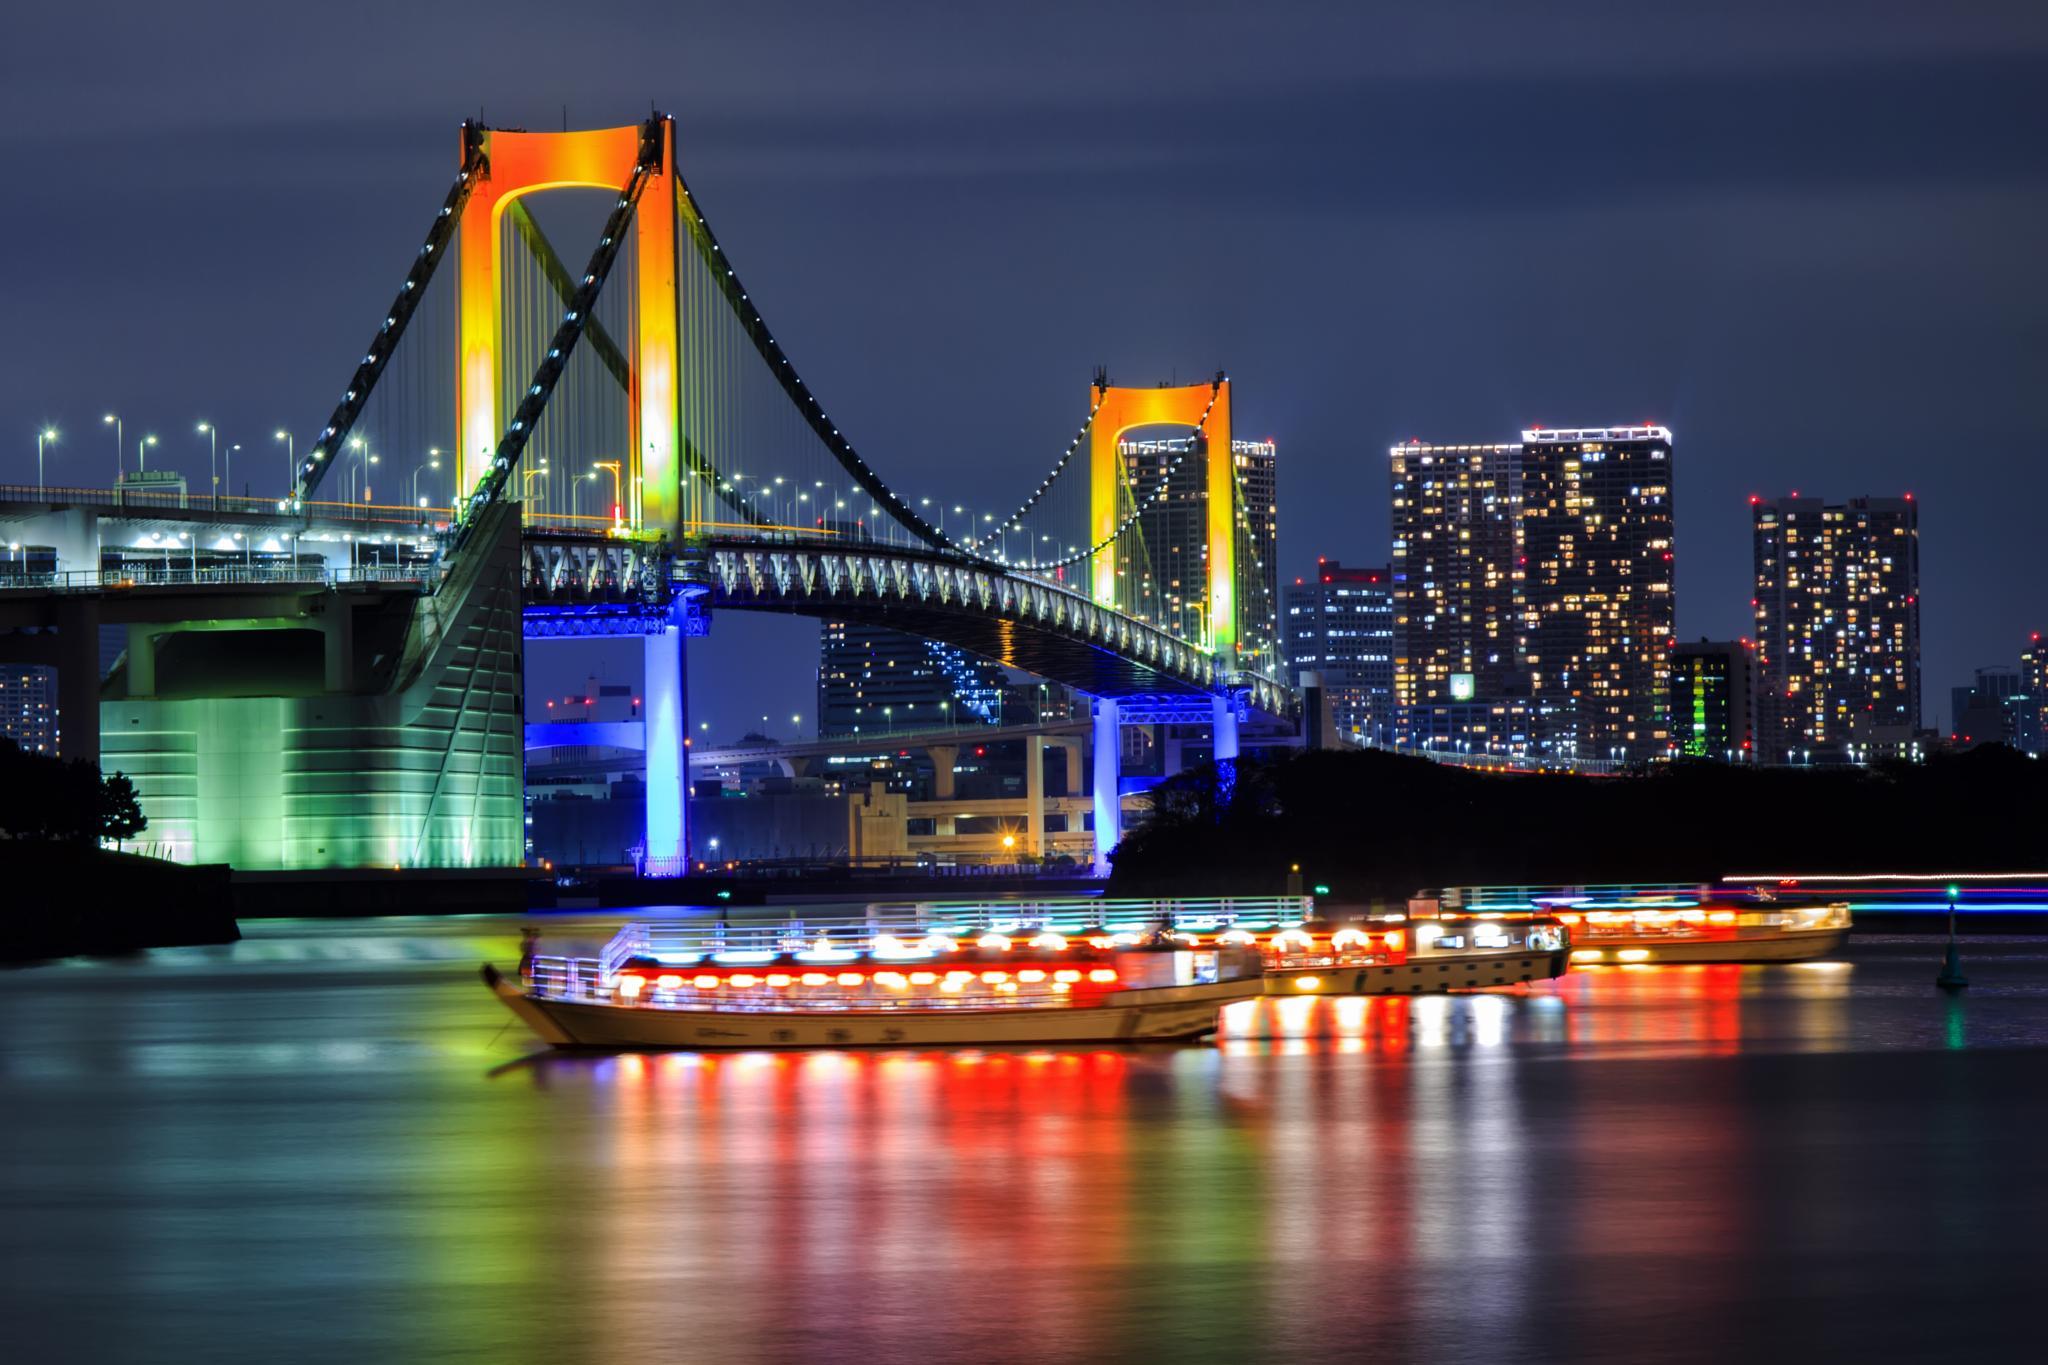 Rainbow Bridge  by Budhi Setyawan